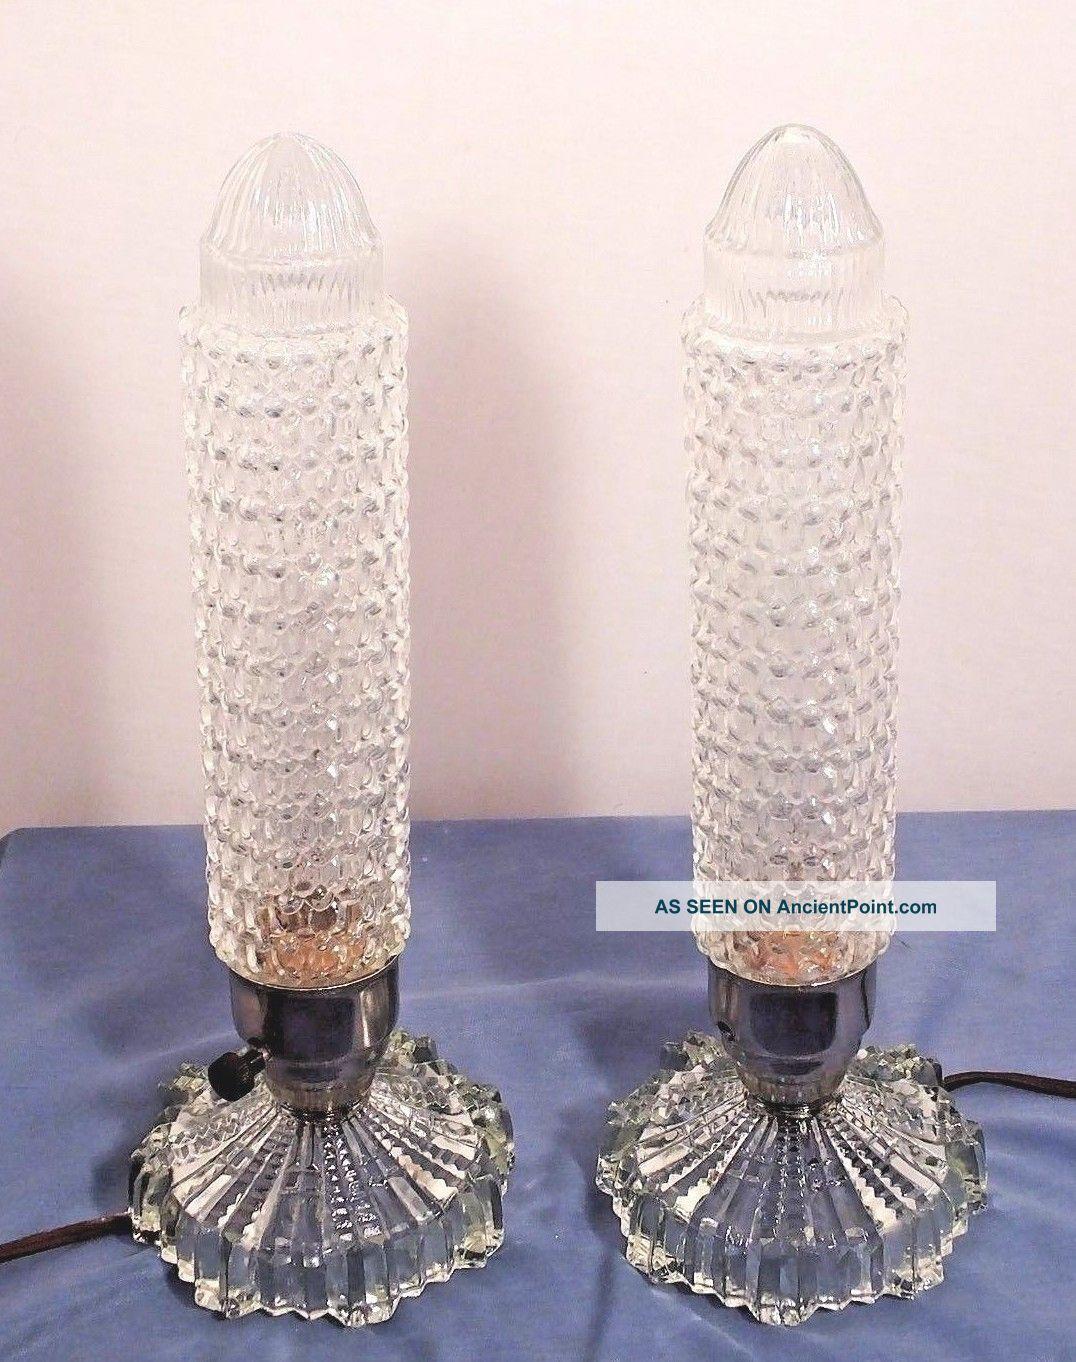 2 Art Deco Vintage Torpedo Skyscraper Bullet Lamps Glass Shades Boudouir Phallic Art Deco photo